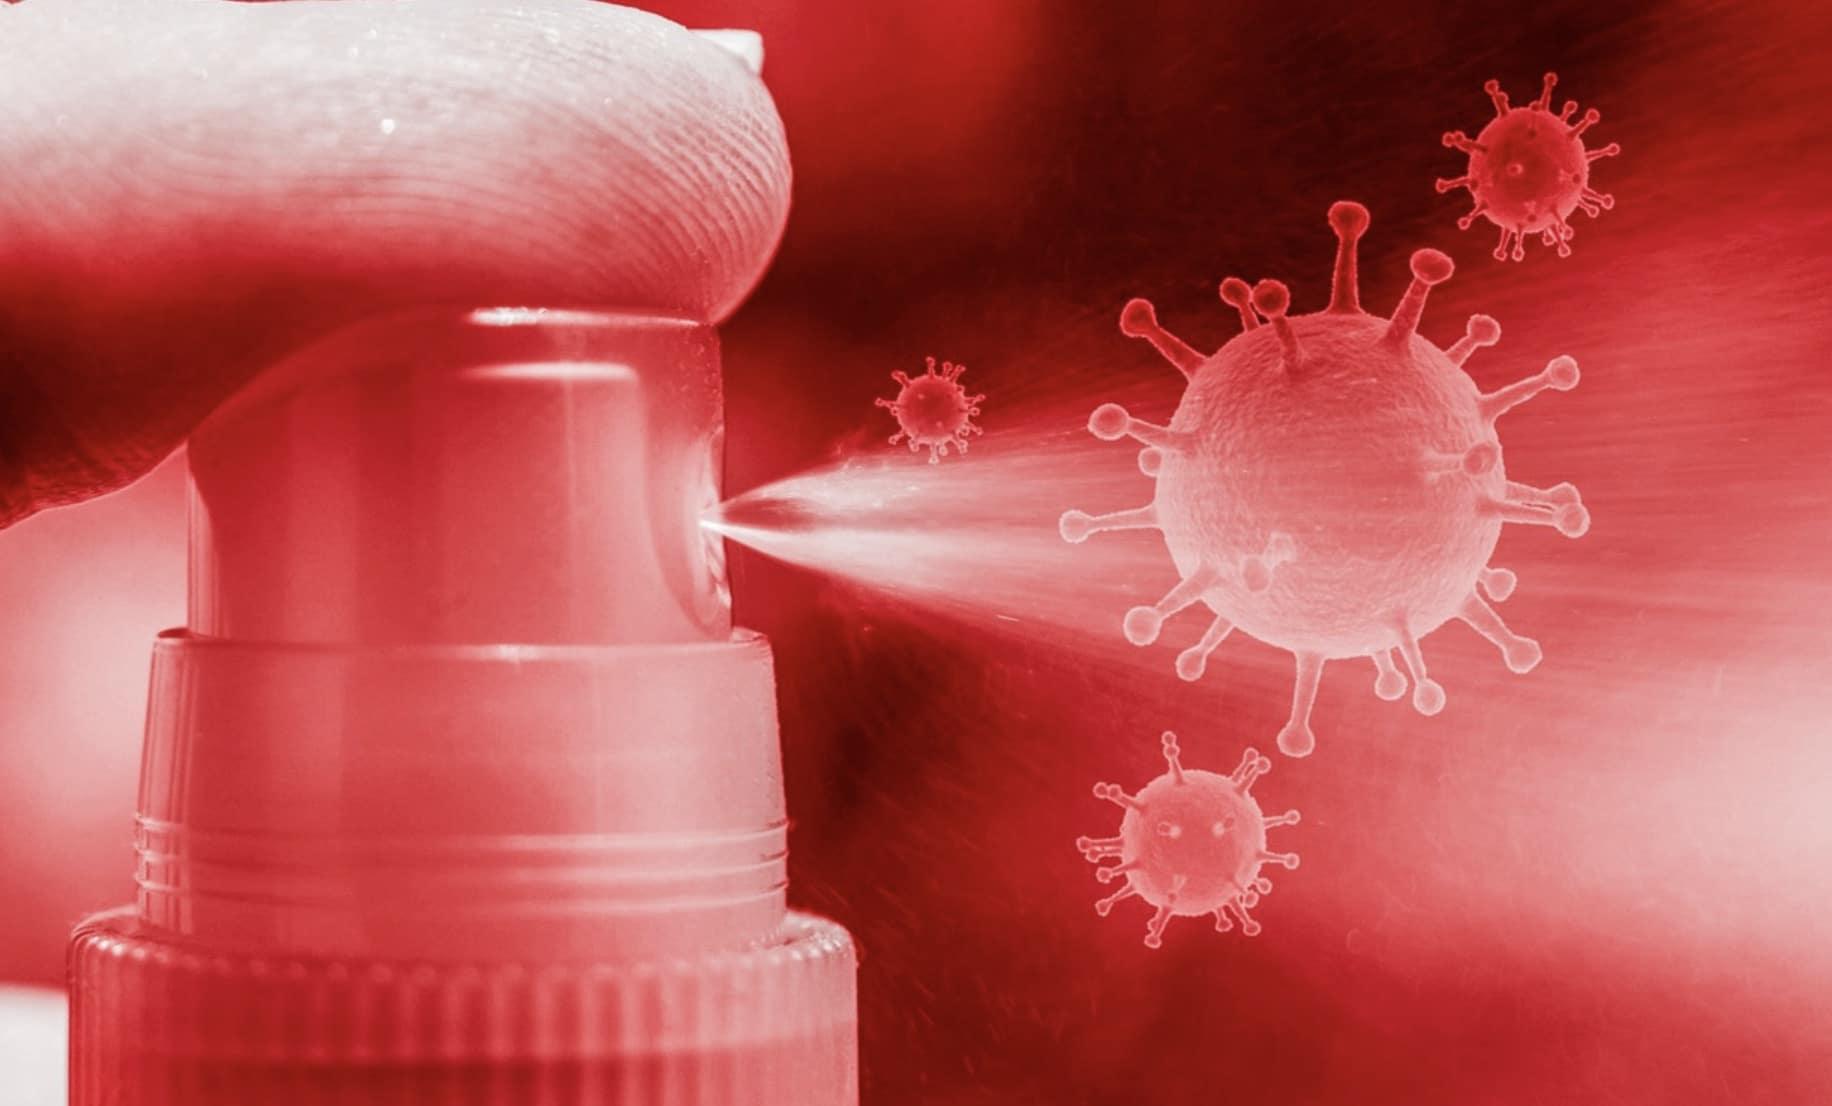 Spray contre le coronavirus